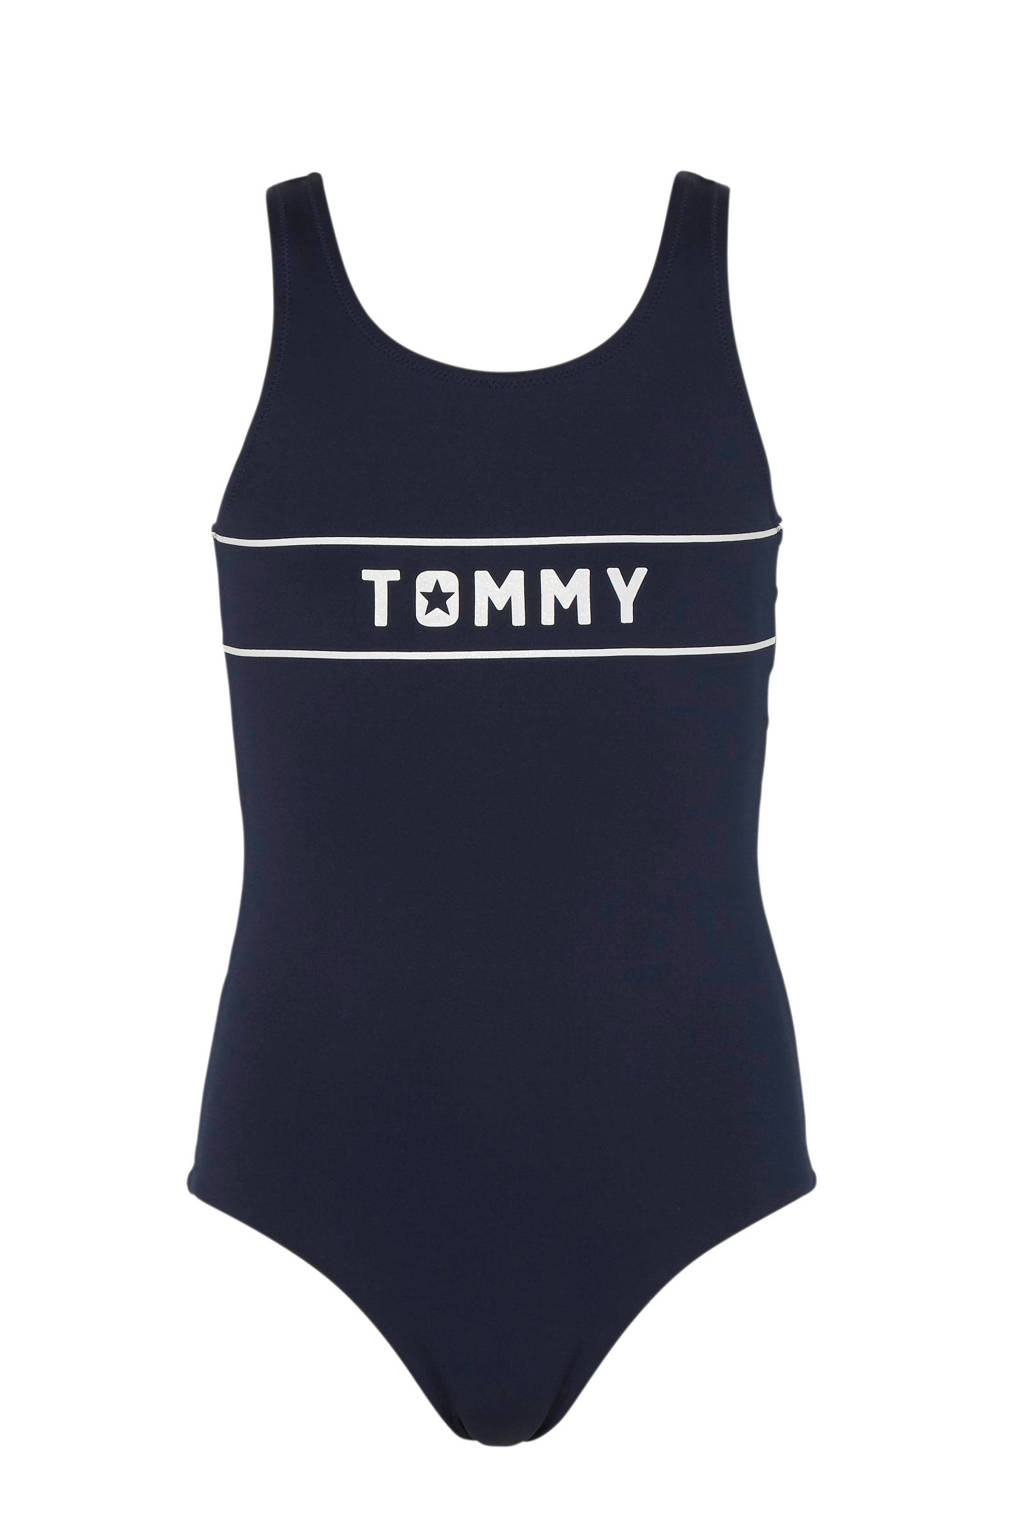 Tommy Hilfiger badpak met printopdruk marine, Marine/wit